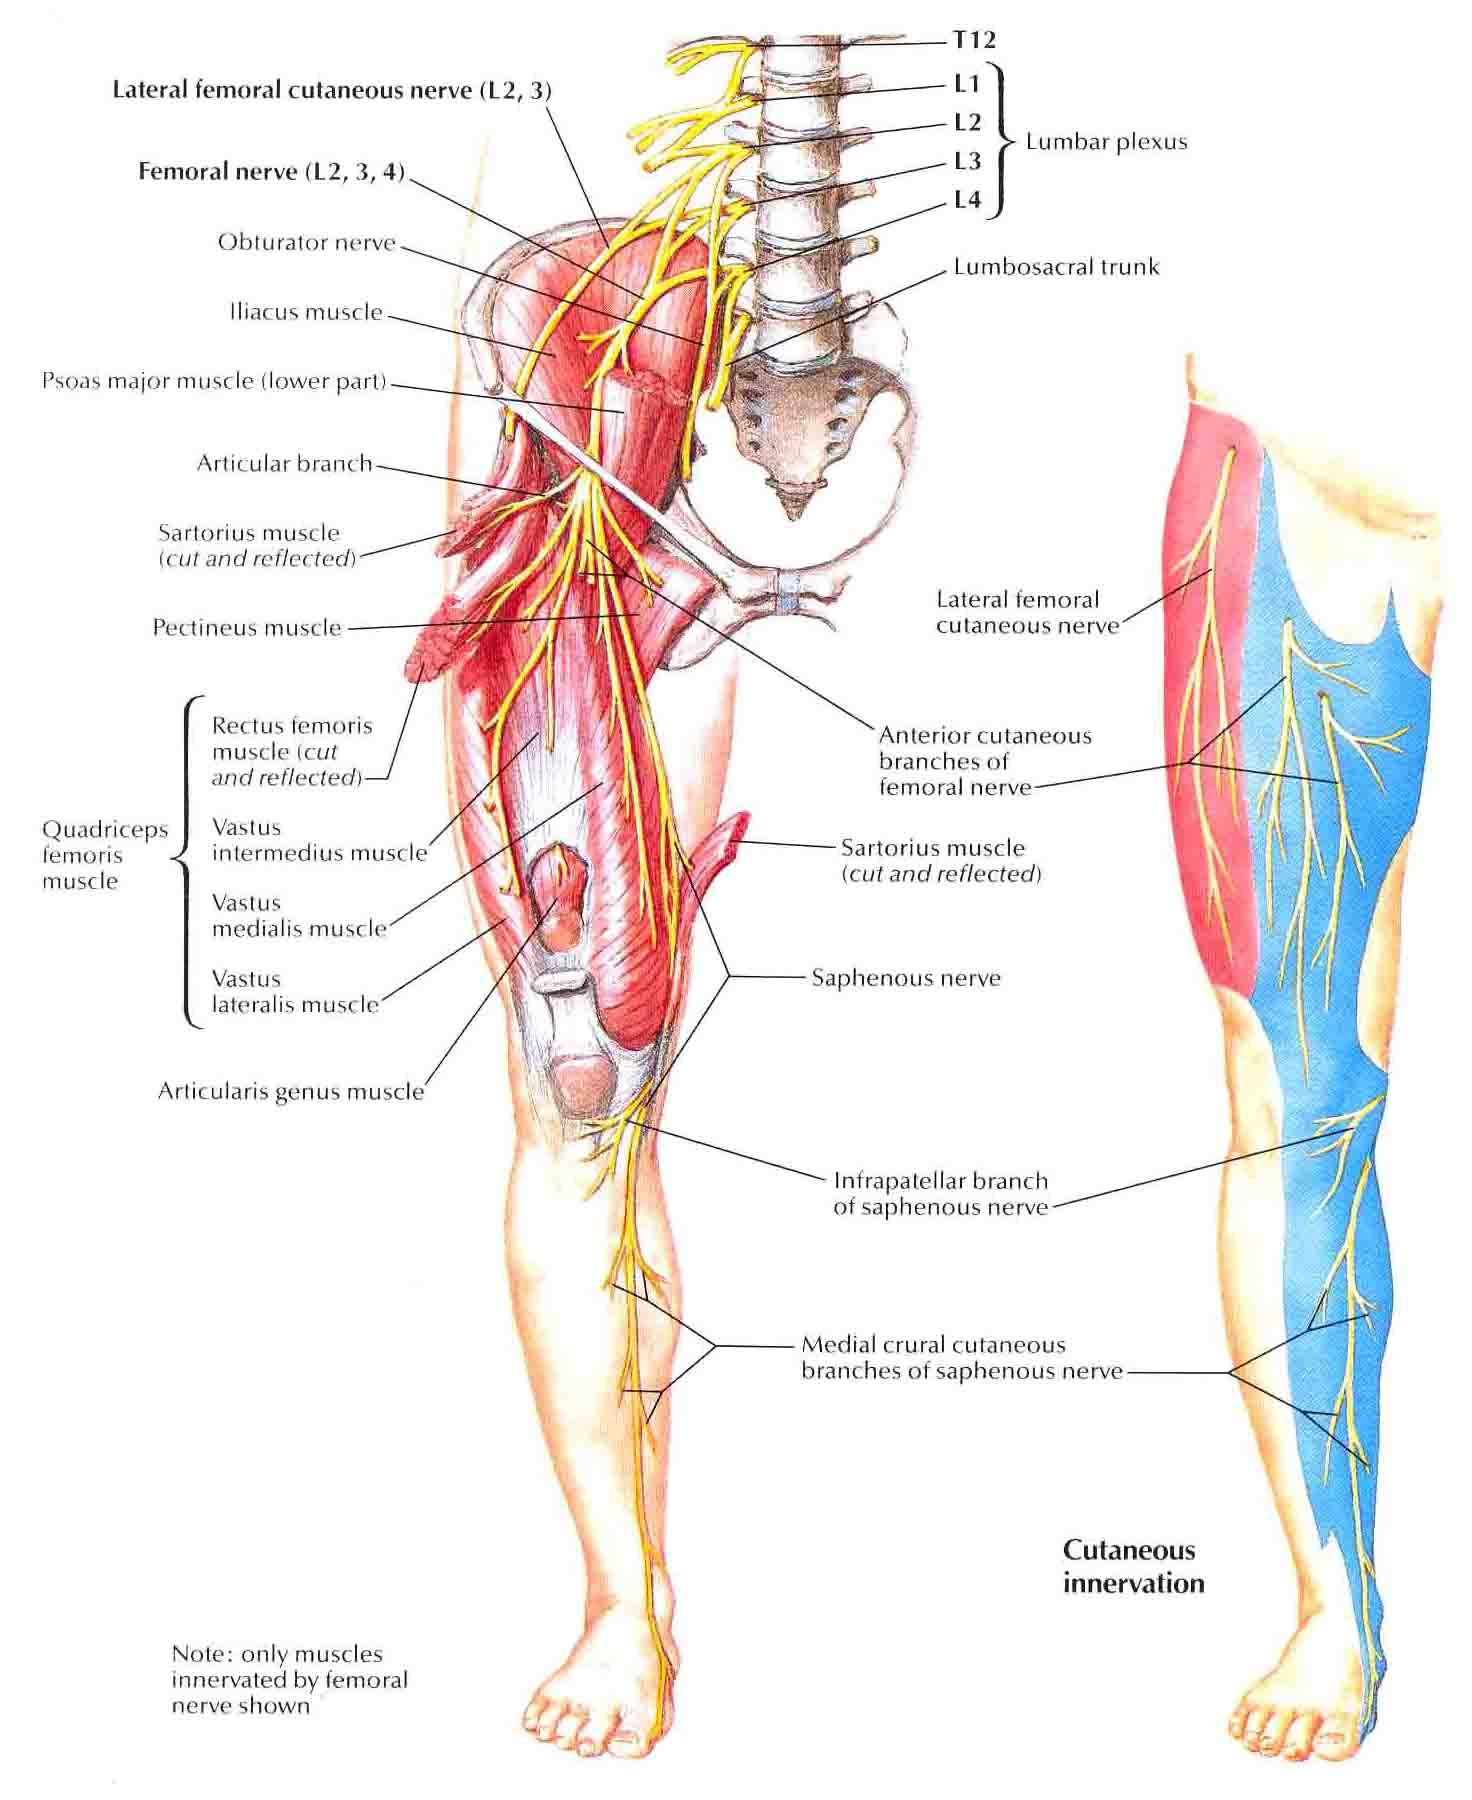 squat problems - form and technique - uk muscle bodybuilding forum, Muscles